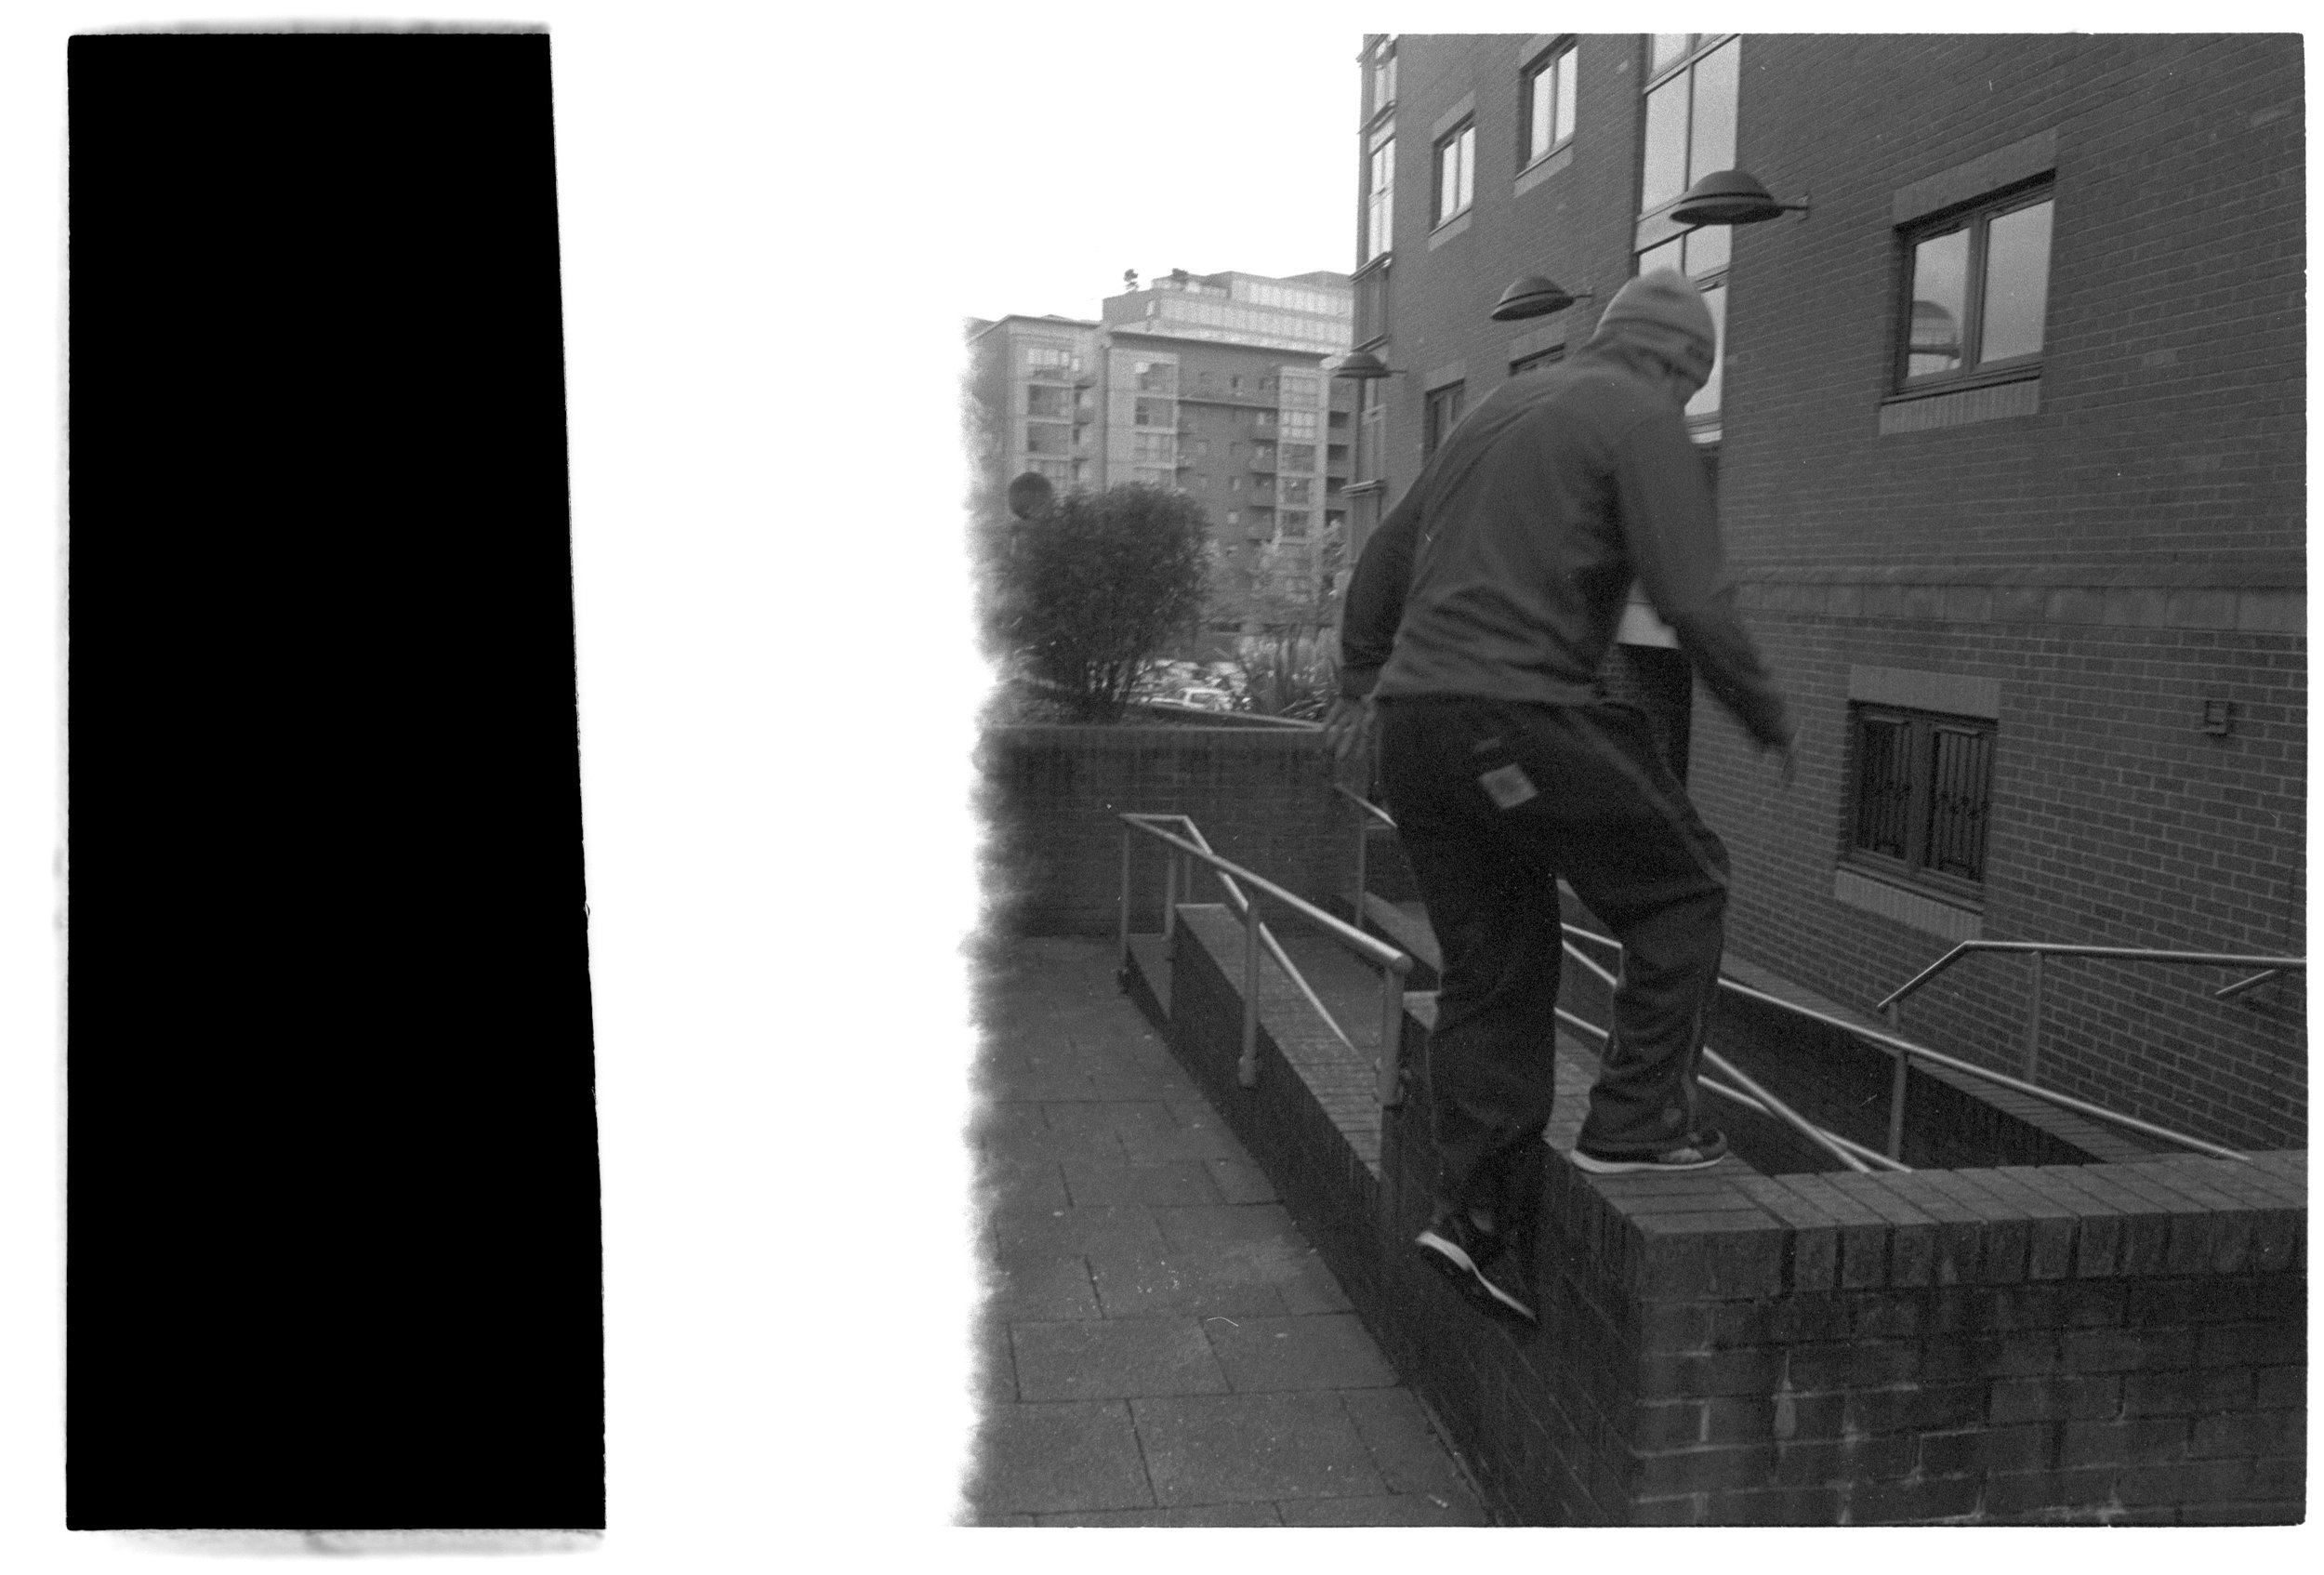 Negs scan - Docks - 0012.jpeg